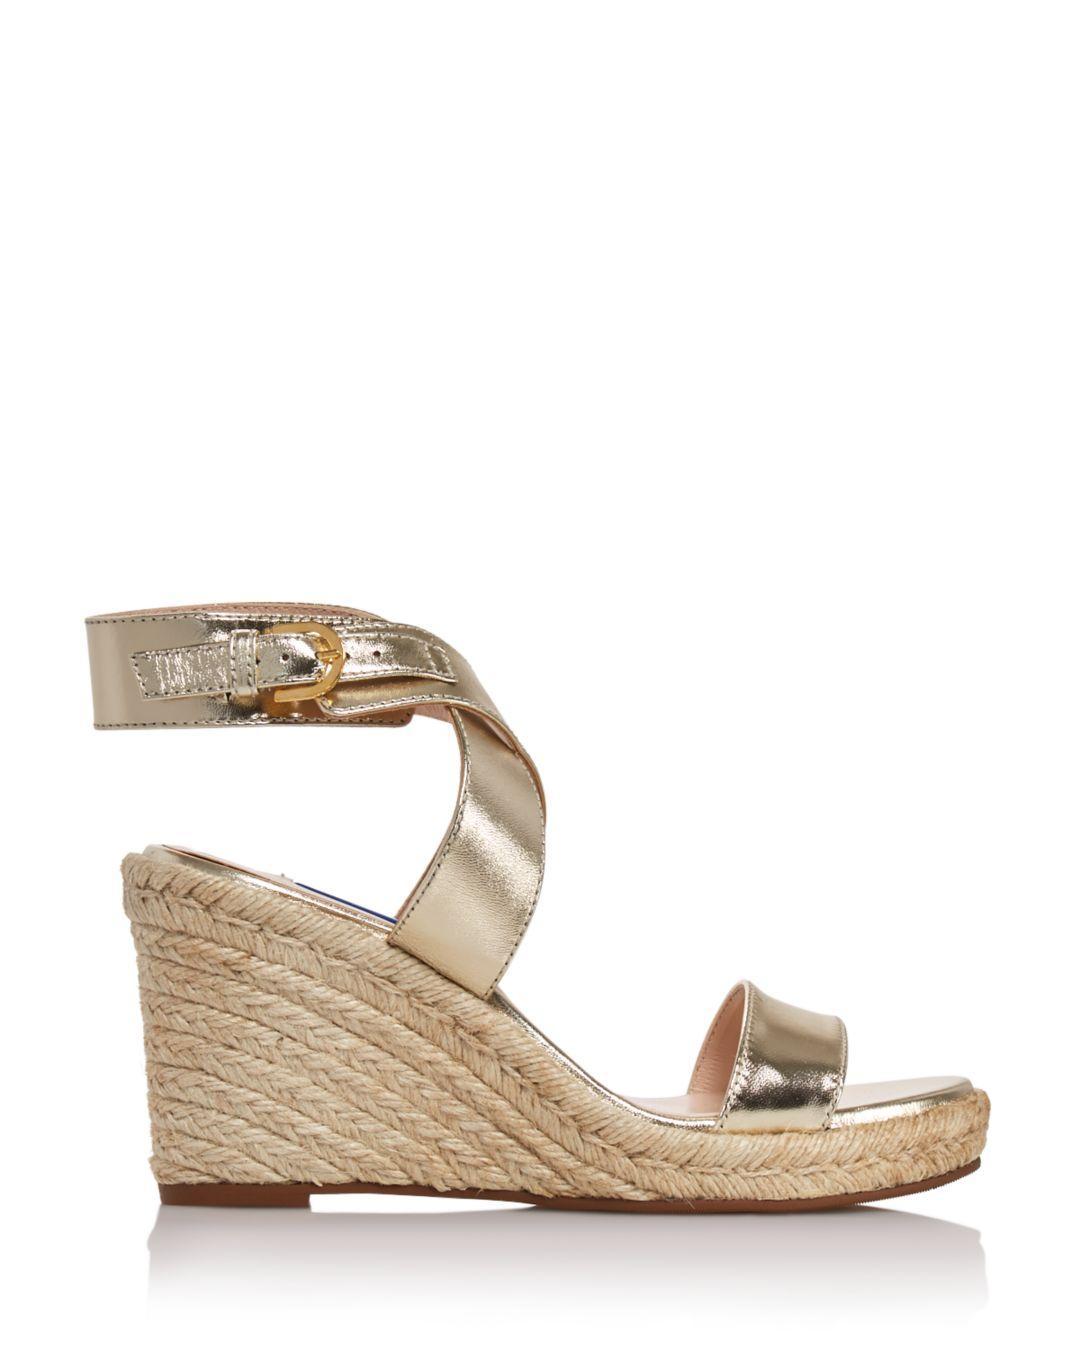 c569a4e98739 Lyst - Stuart Weitzman Lexia Metallic Leather Wedge Sandals